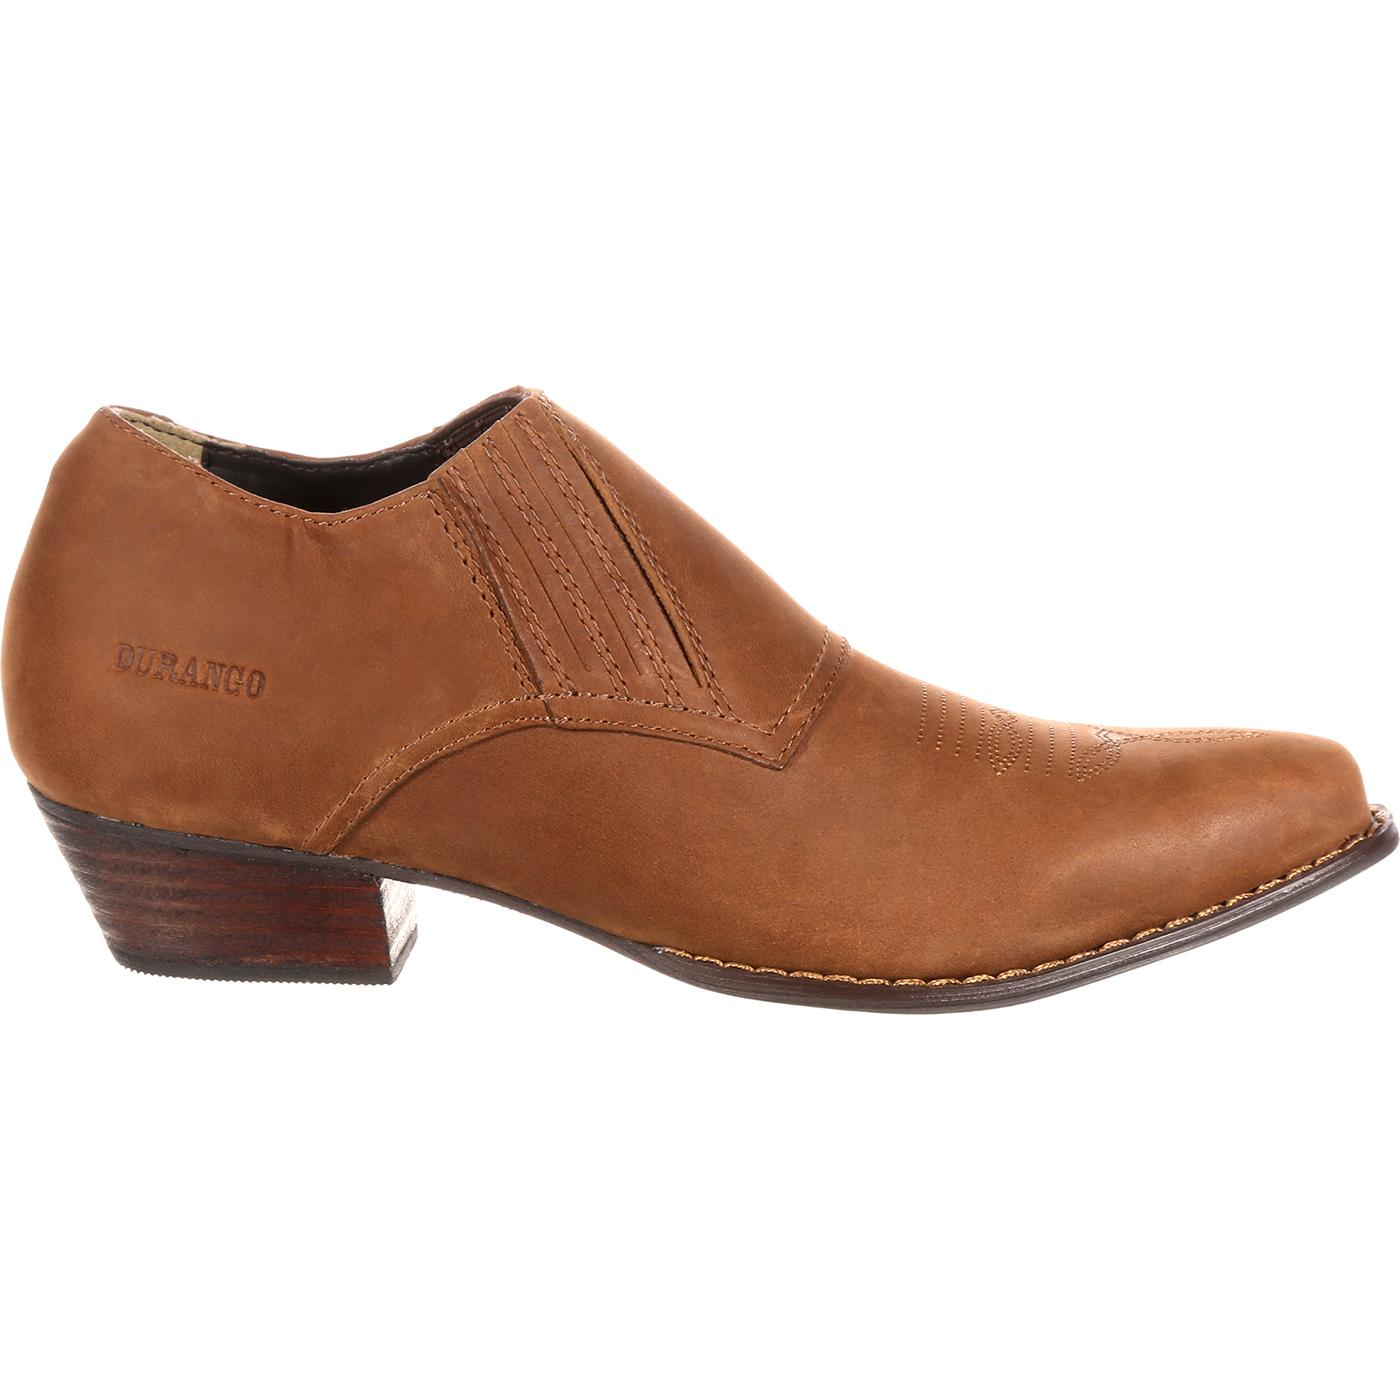 25d65f994 Women's Comfort Brown Western Shoe Boot, Crush by Durango